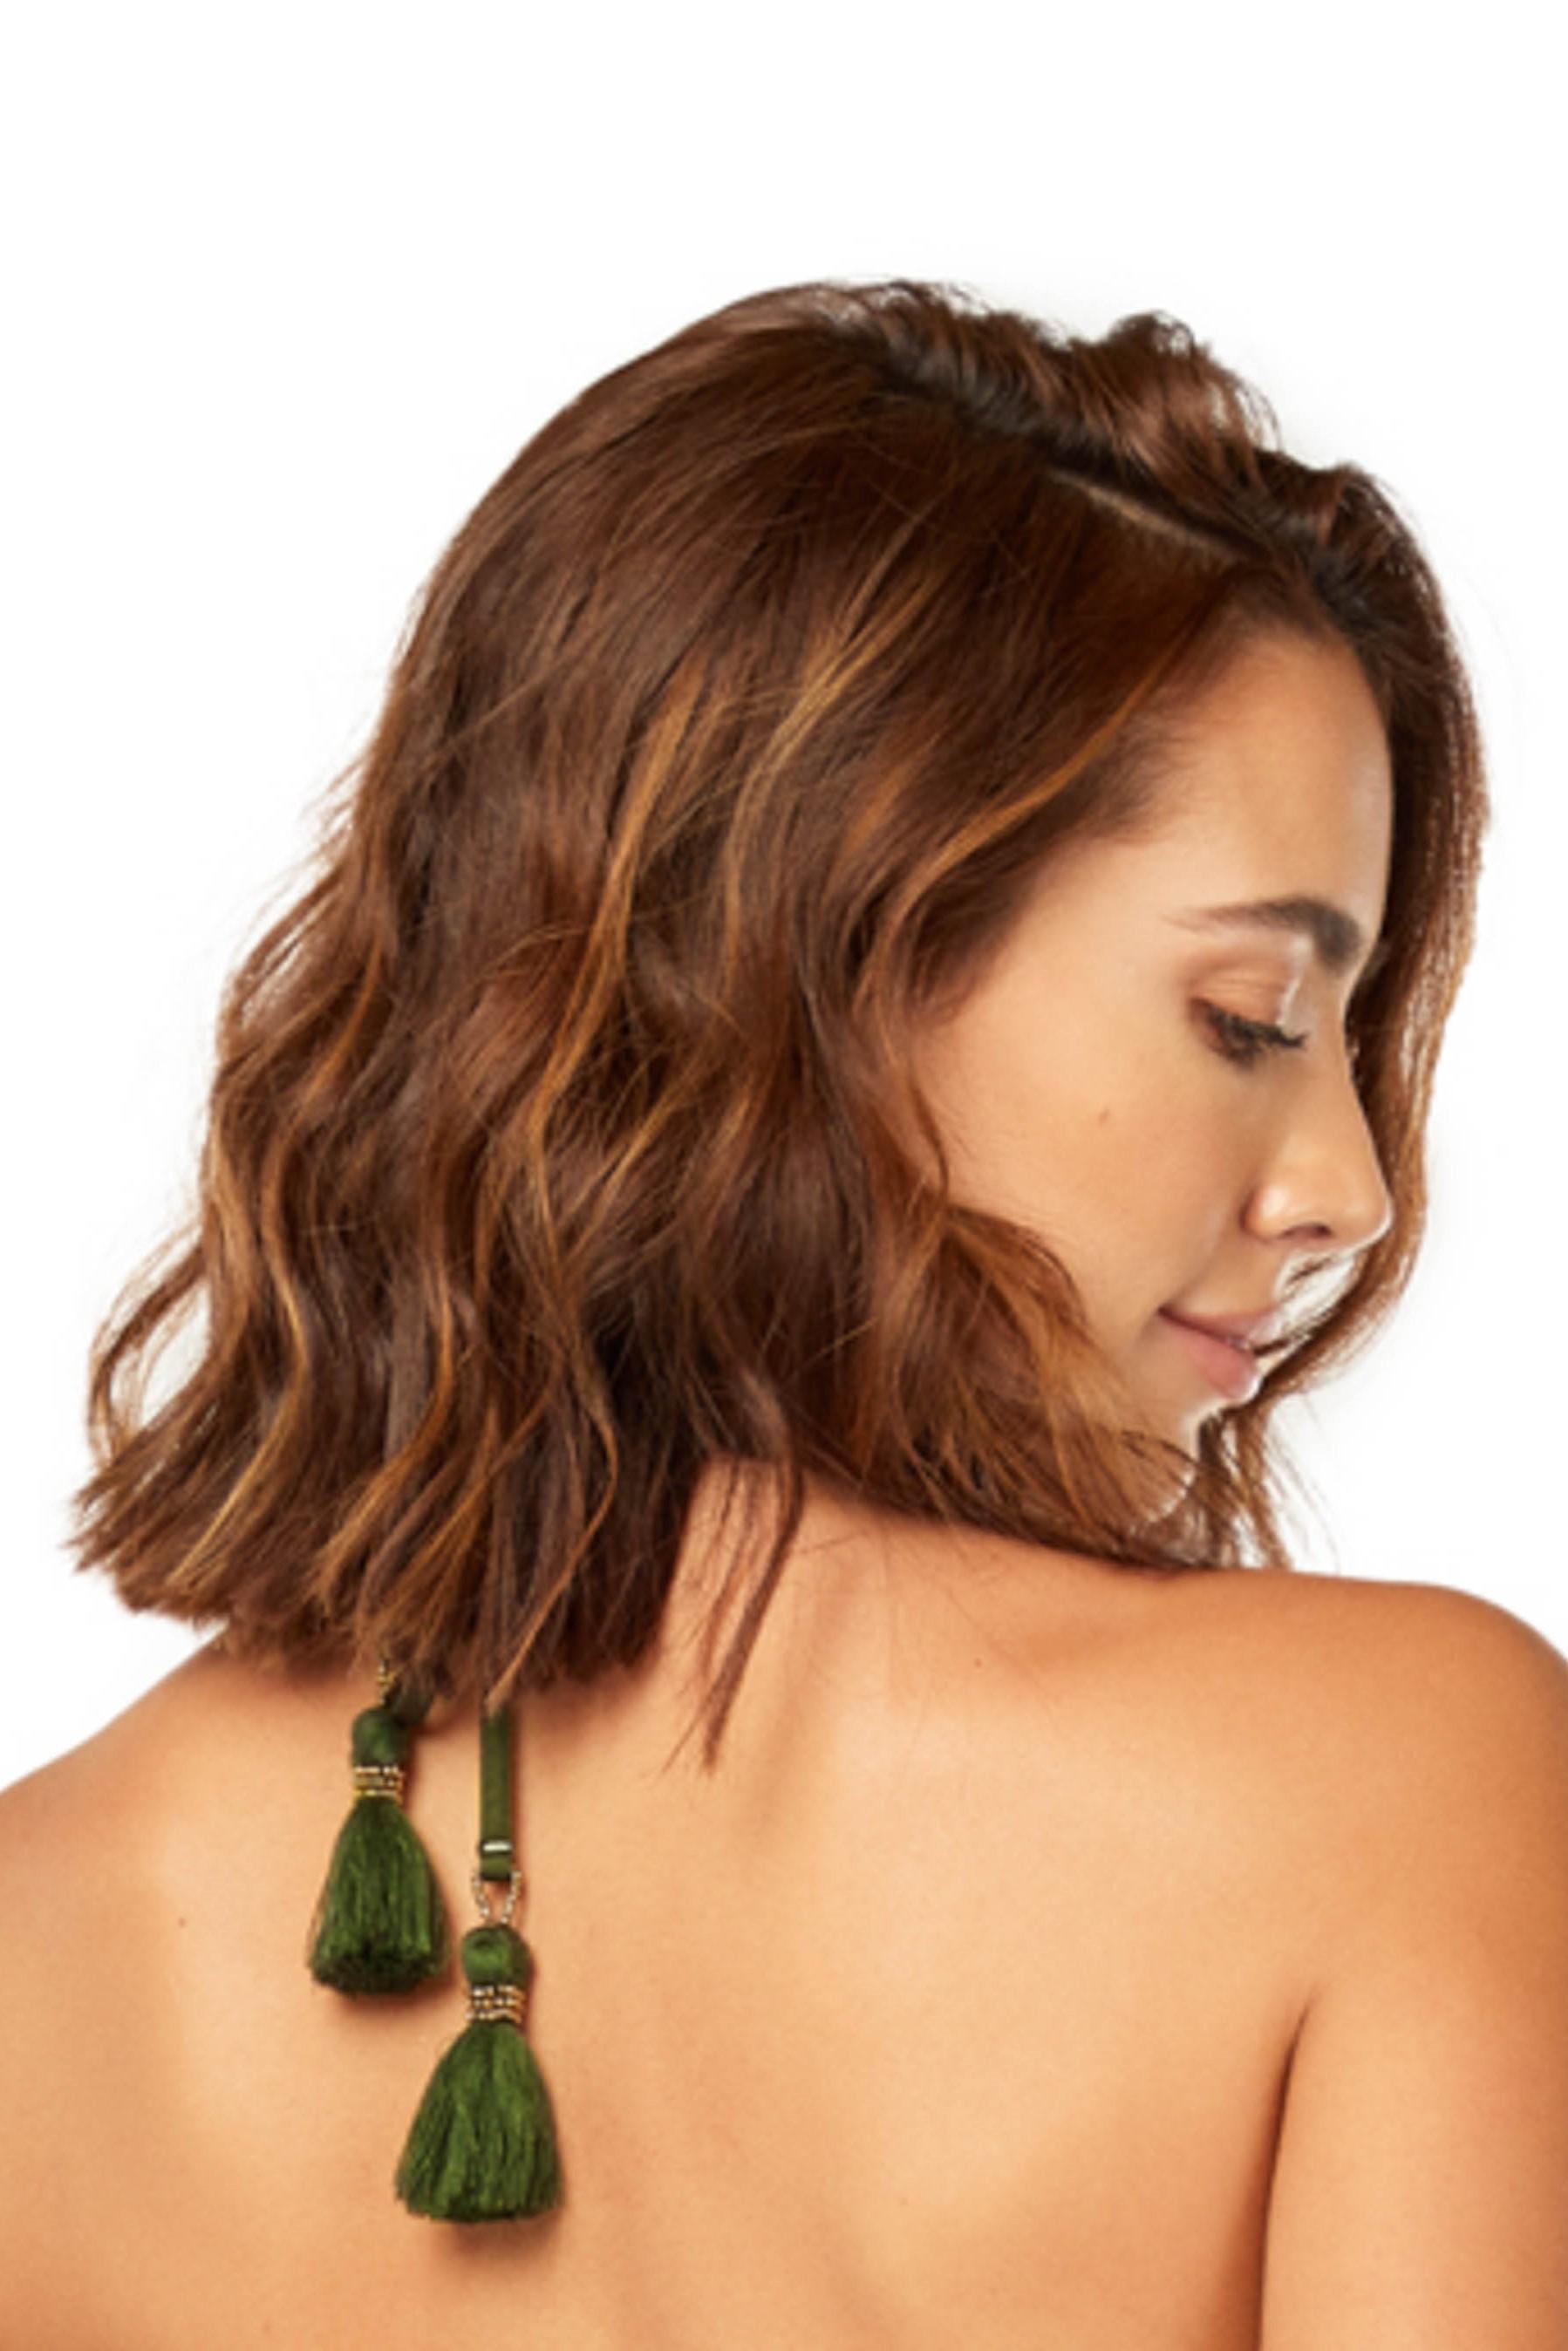 Cosita Linda Haere Mai Triangle Bikini Top Khaki Green